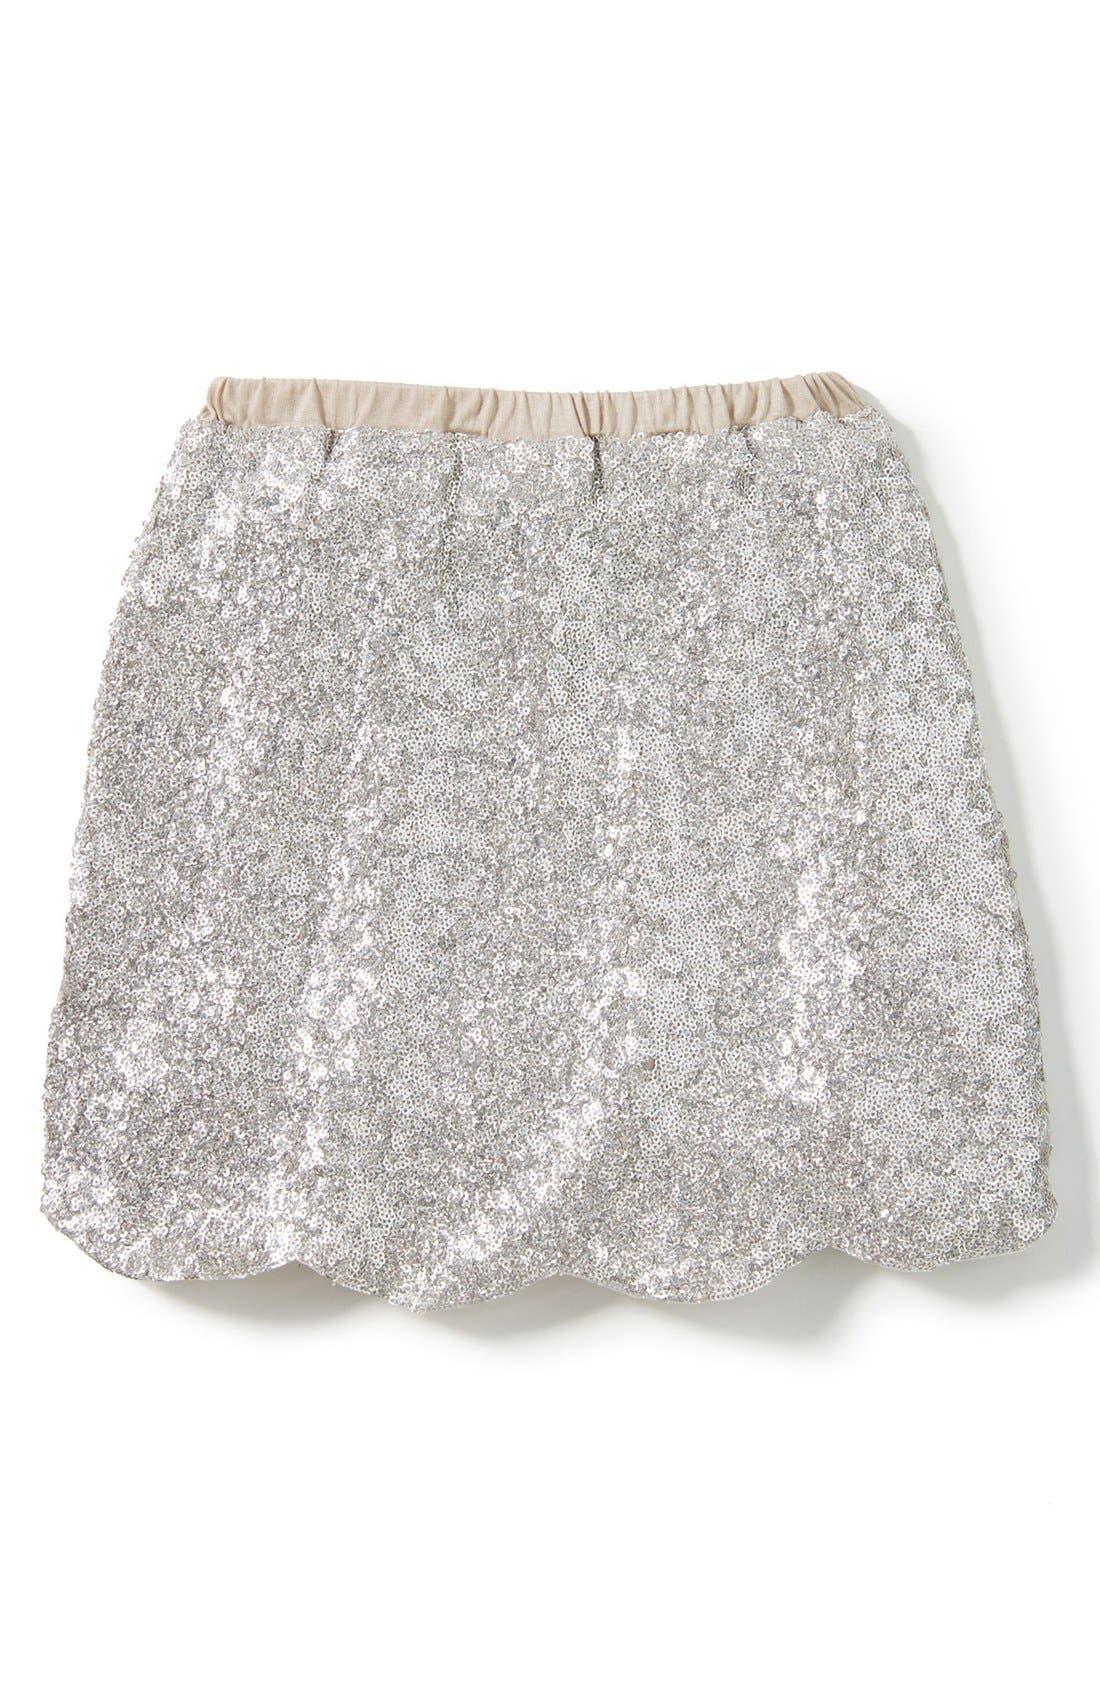 Drew Sequin Skirt,                             Main thumbnail 1, color,                             Silver